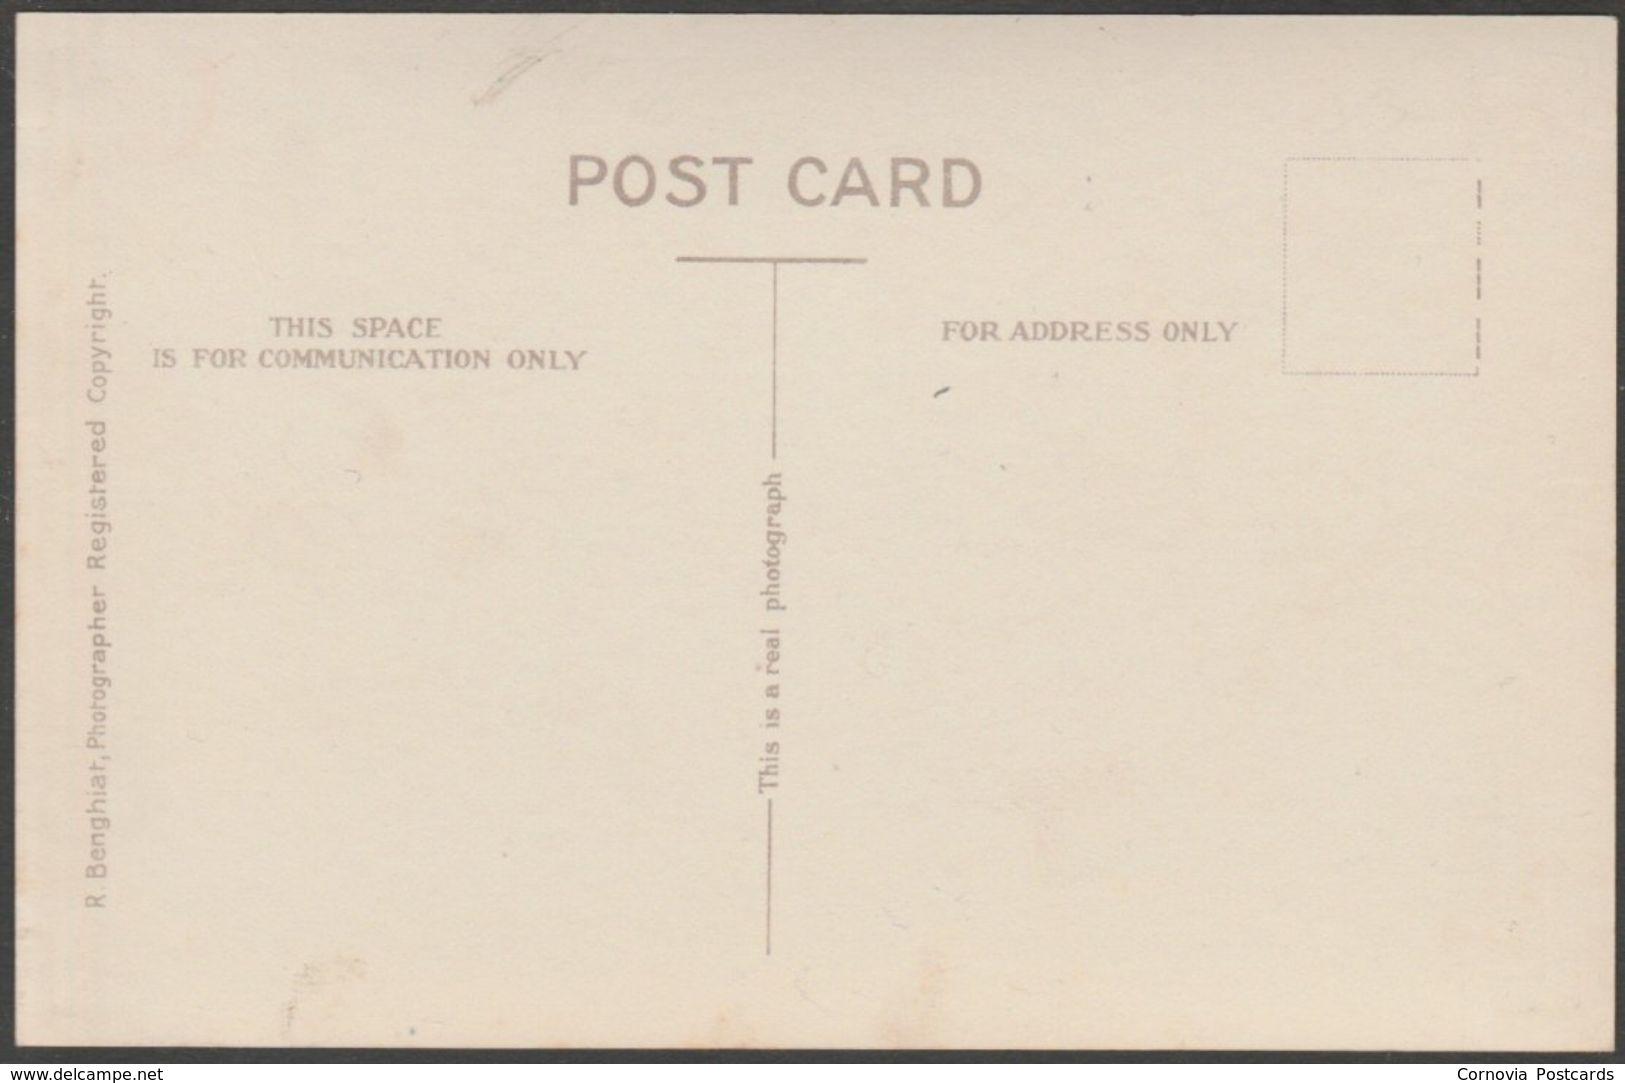 Arab Kiddies, Lehej, Aden, C.1920s - Benghiat RP Postcard - Yemen